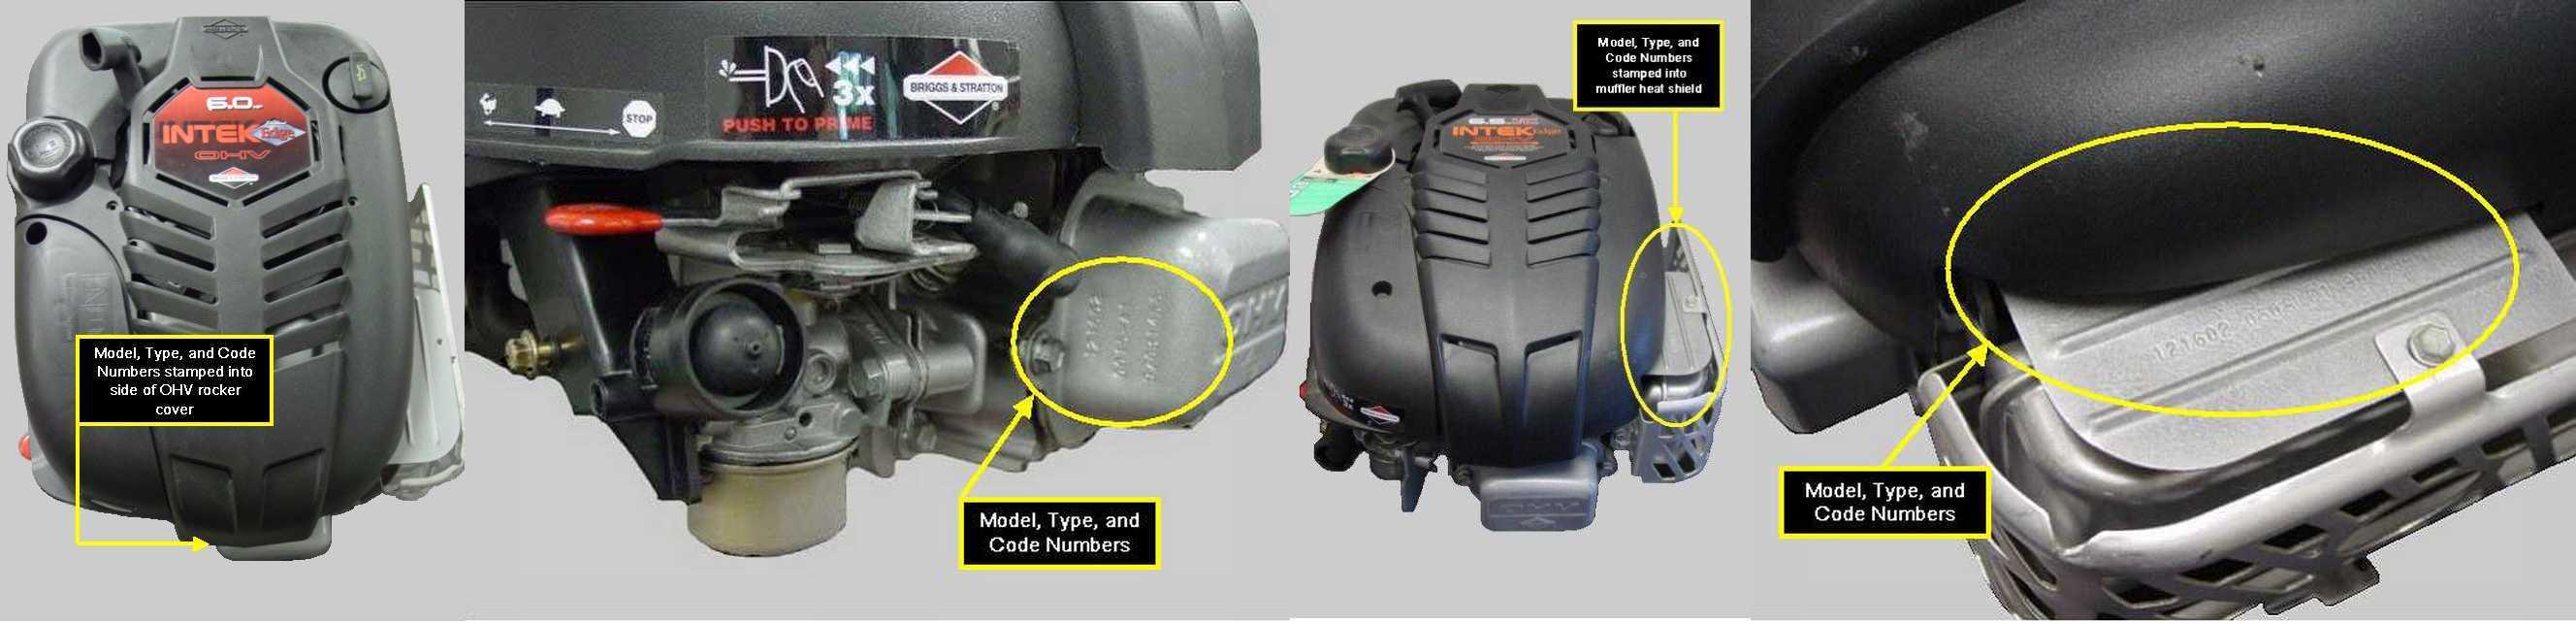 I Have A Craftsman Intek 6 0 2400 Psi Water Pressure